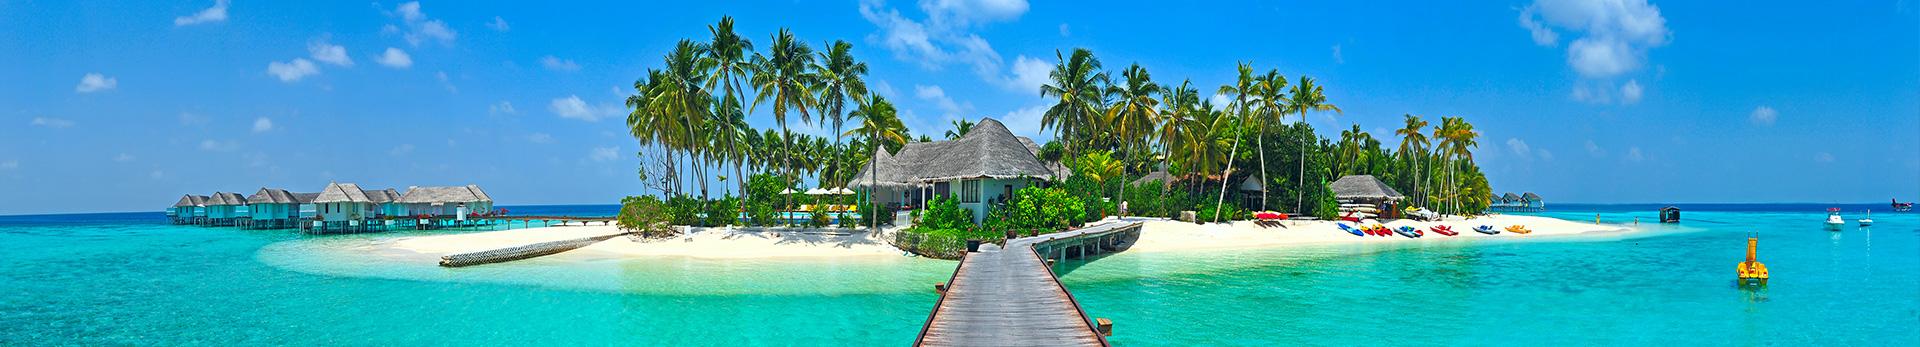 Maldivler Panoramik